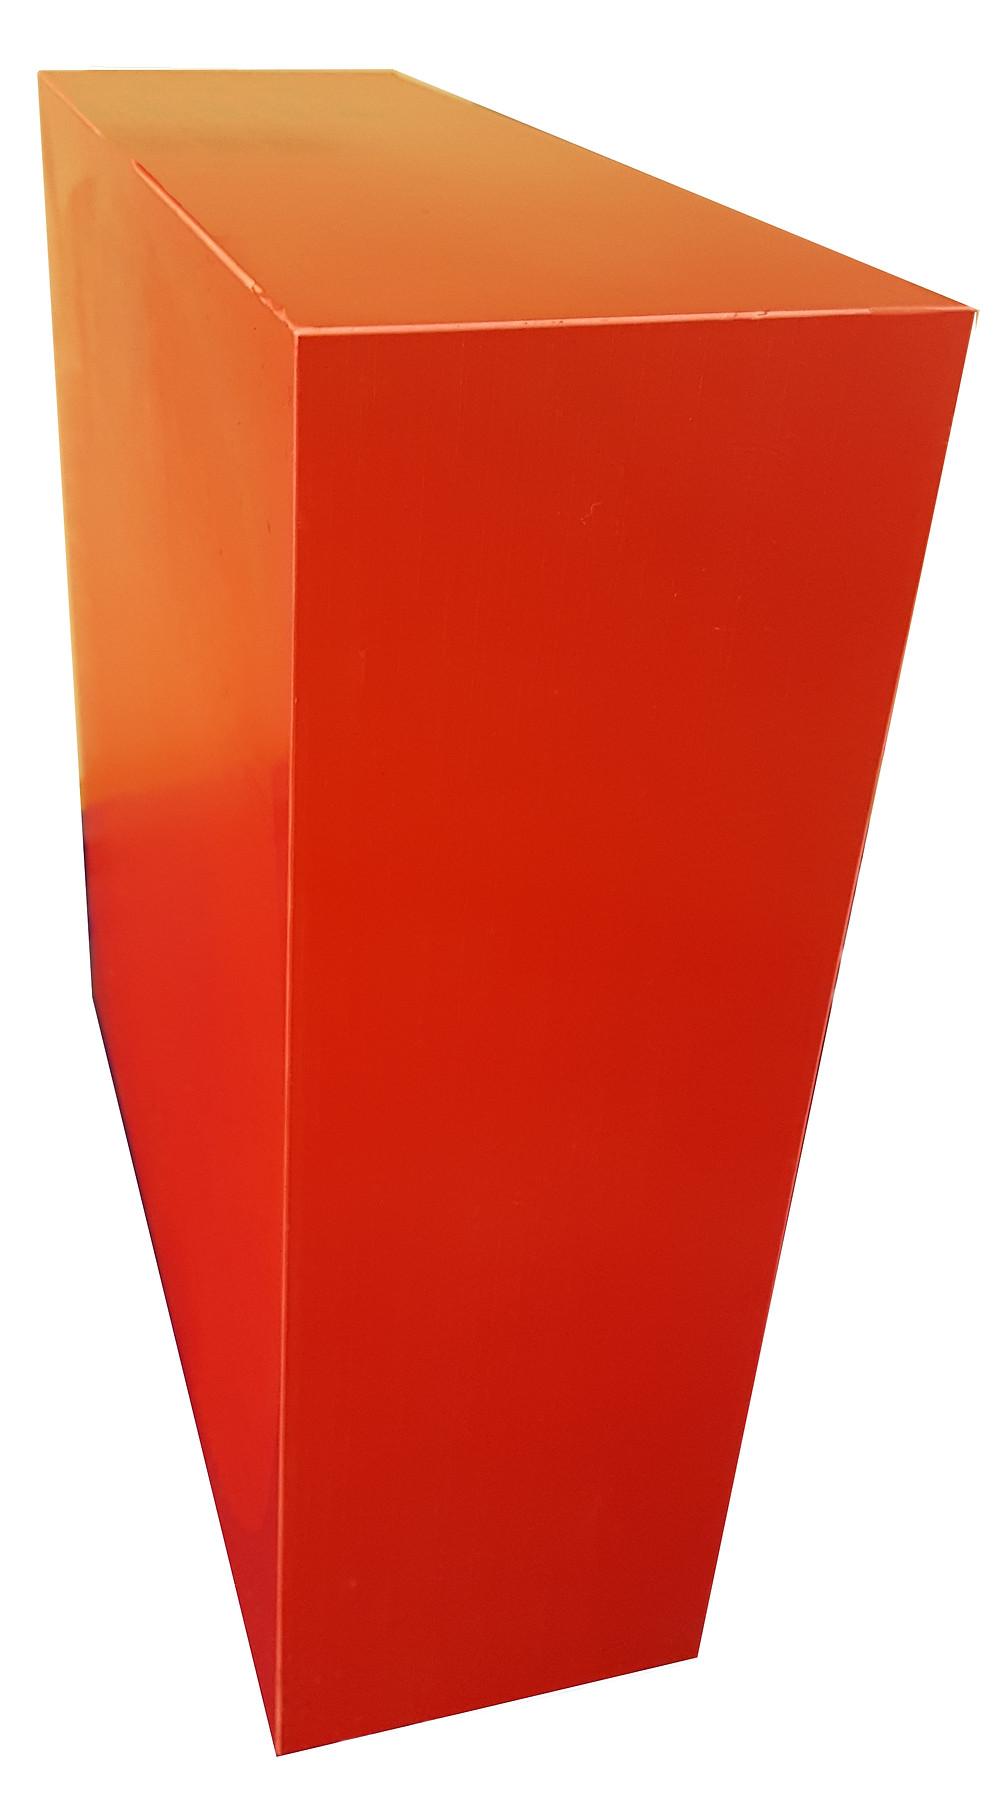 ABS orange block